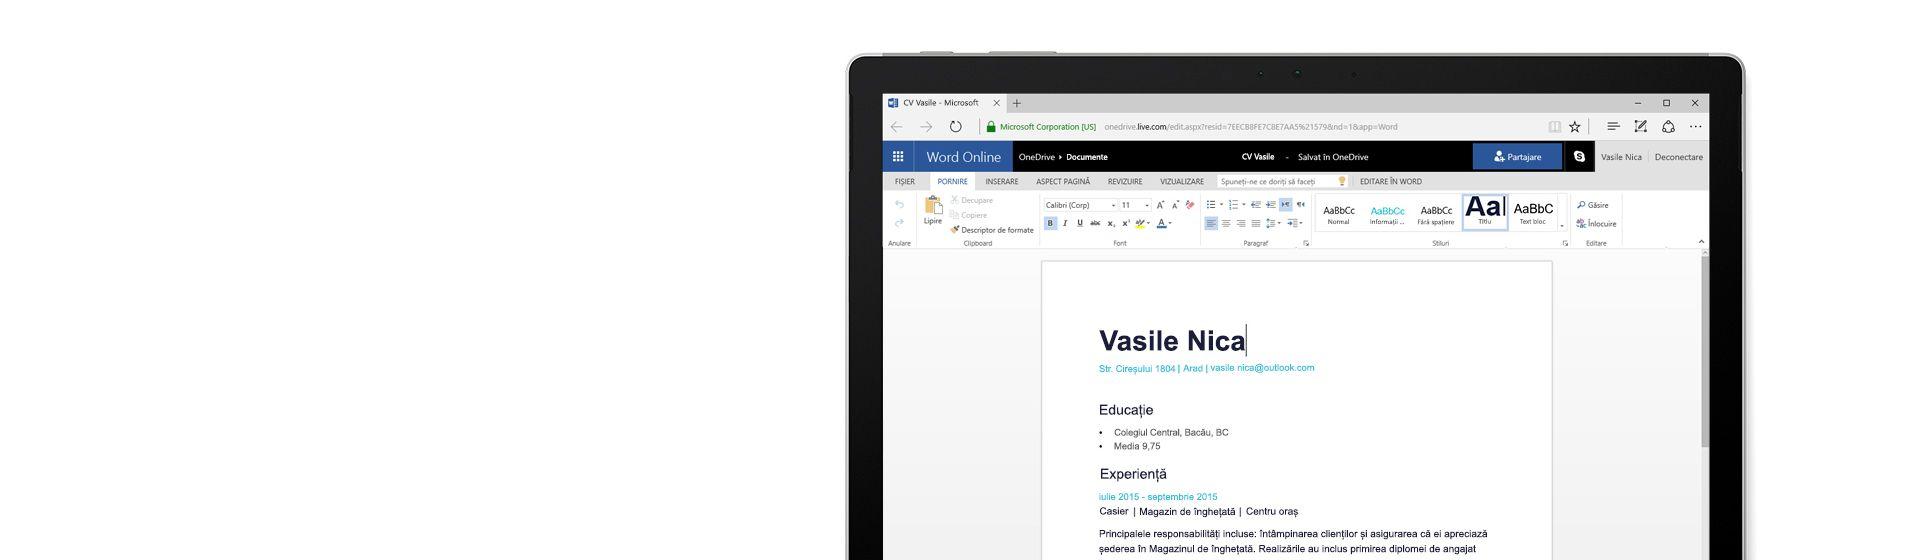 Un ecran de computer afișând un CV creat în Word Online